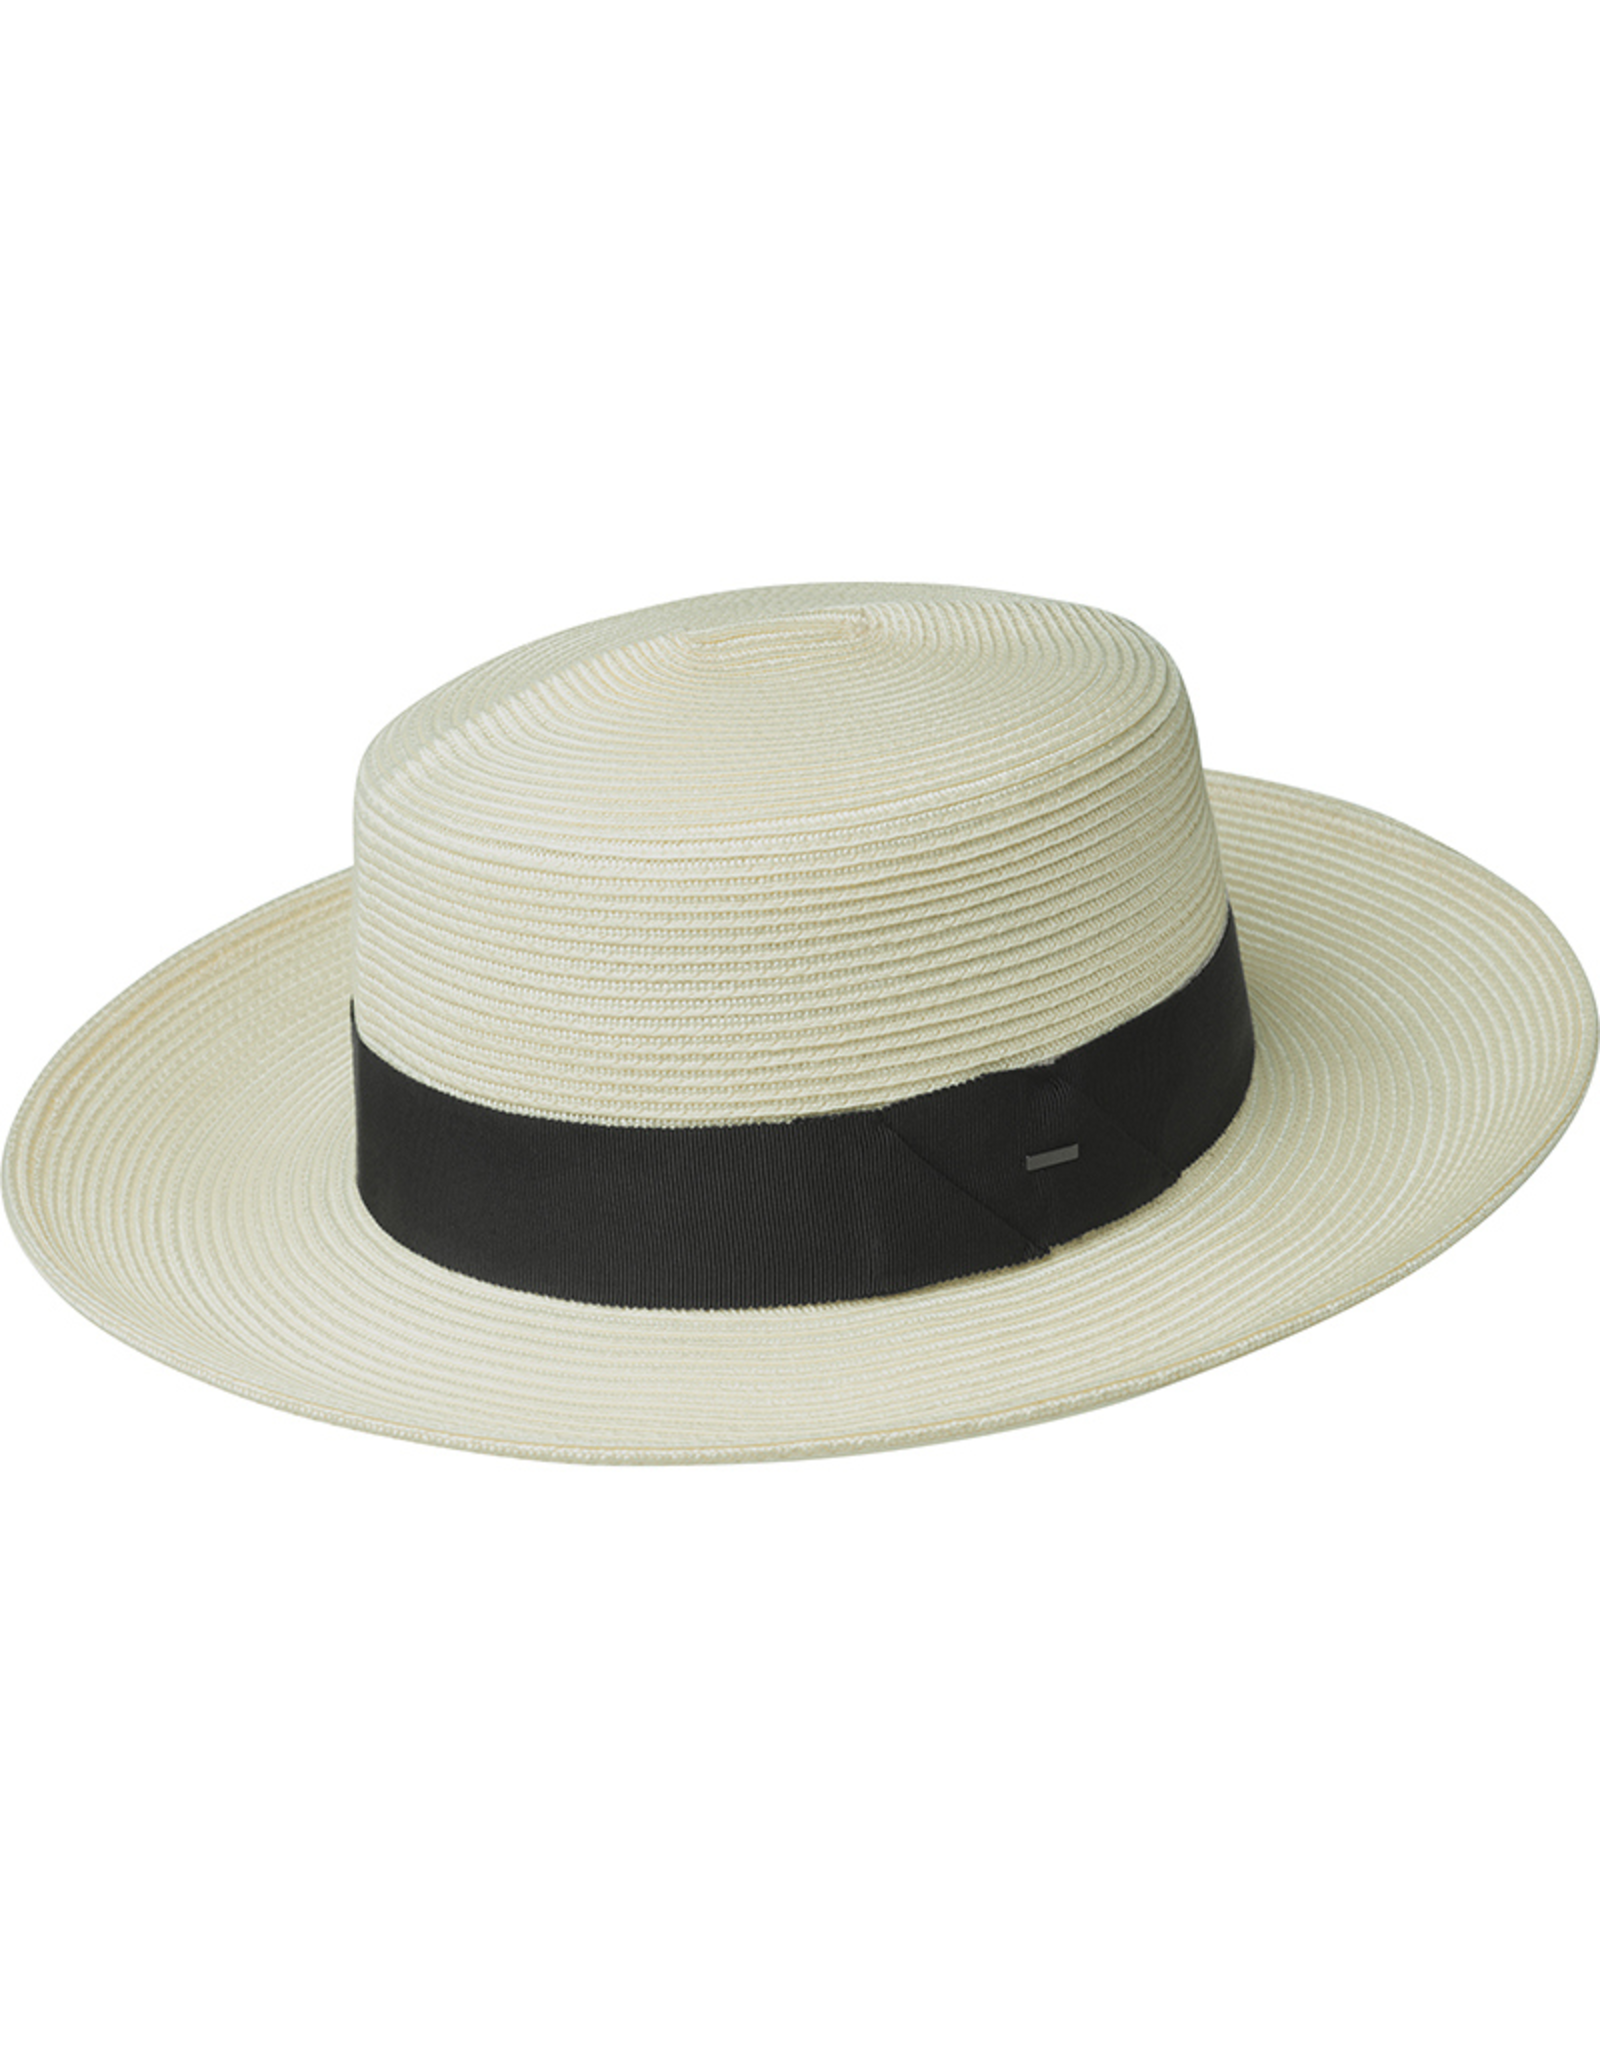 "Bailey Hat Co. HAT-WIDE BRIM ""TIM"" FLAT STRAW"